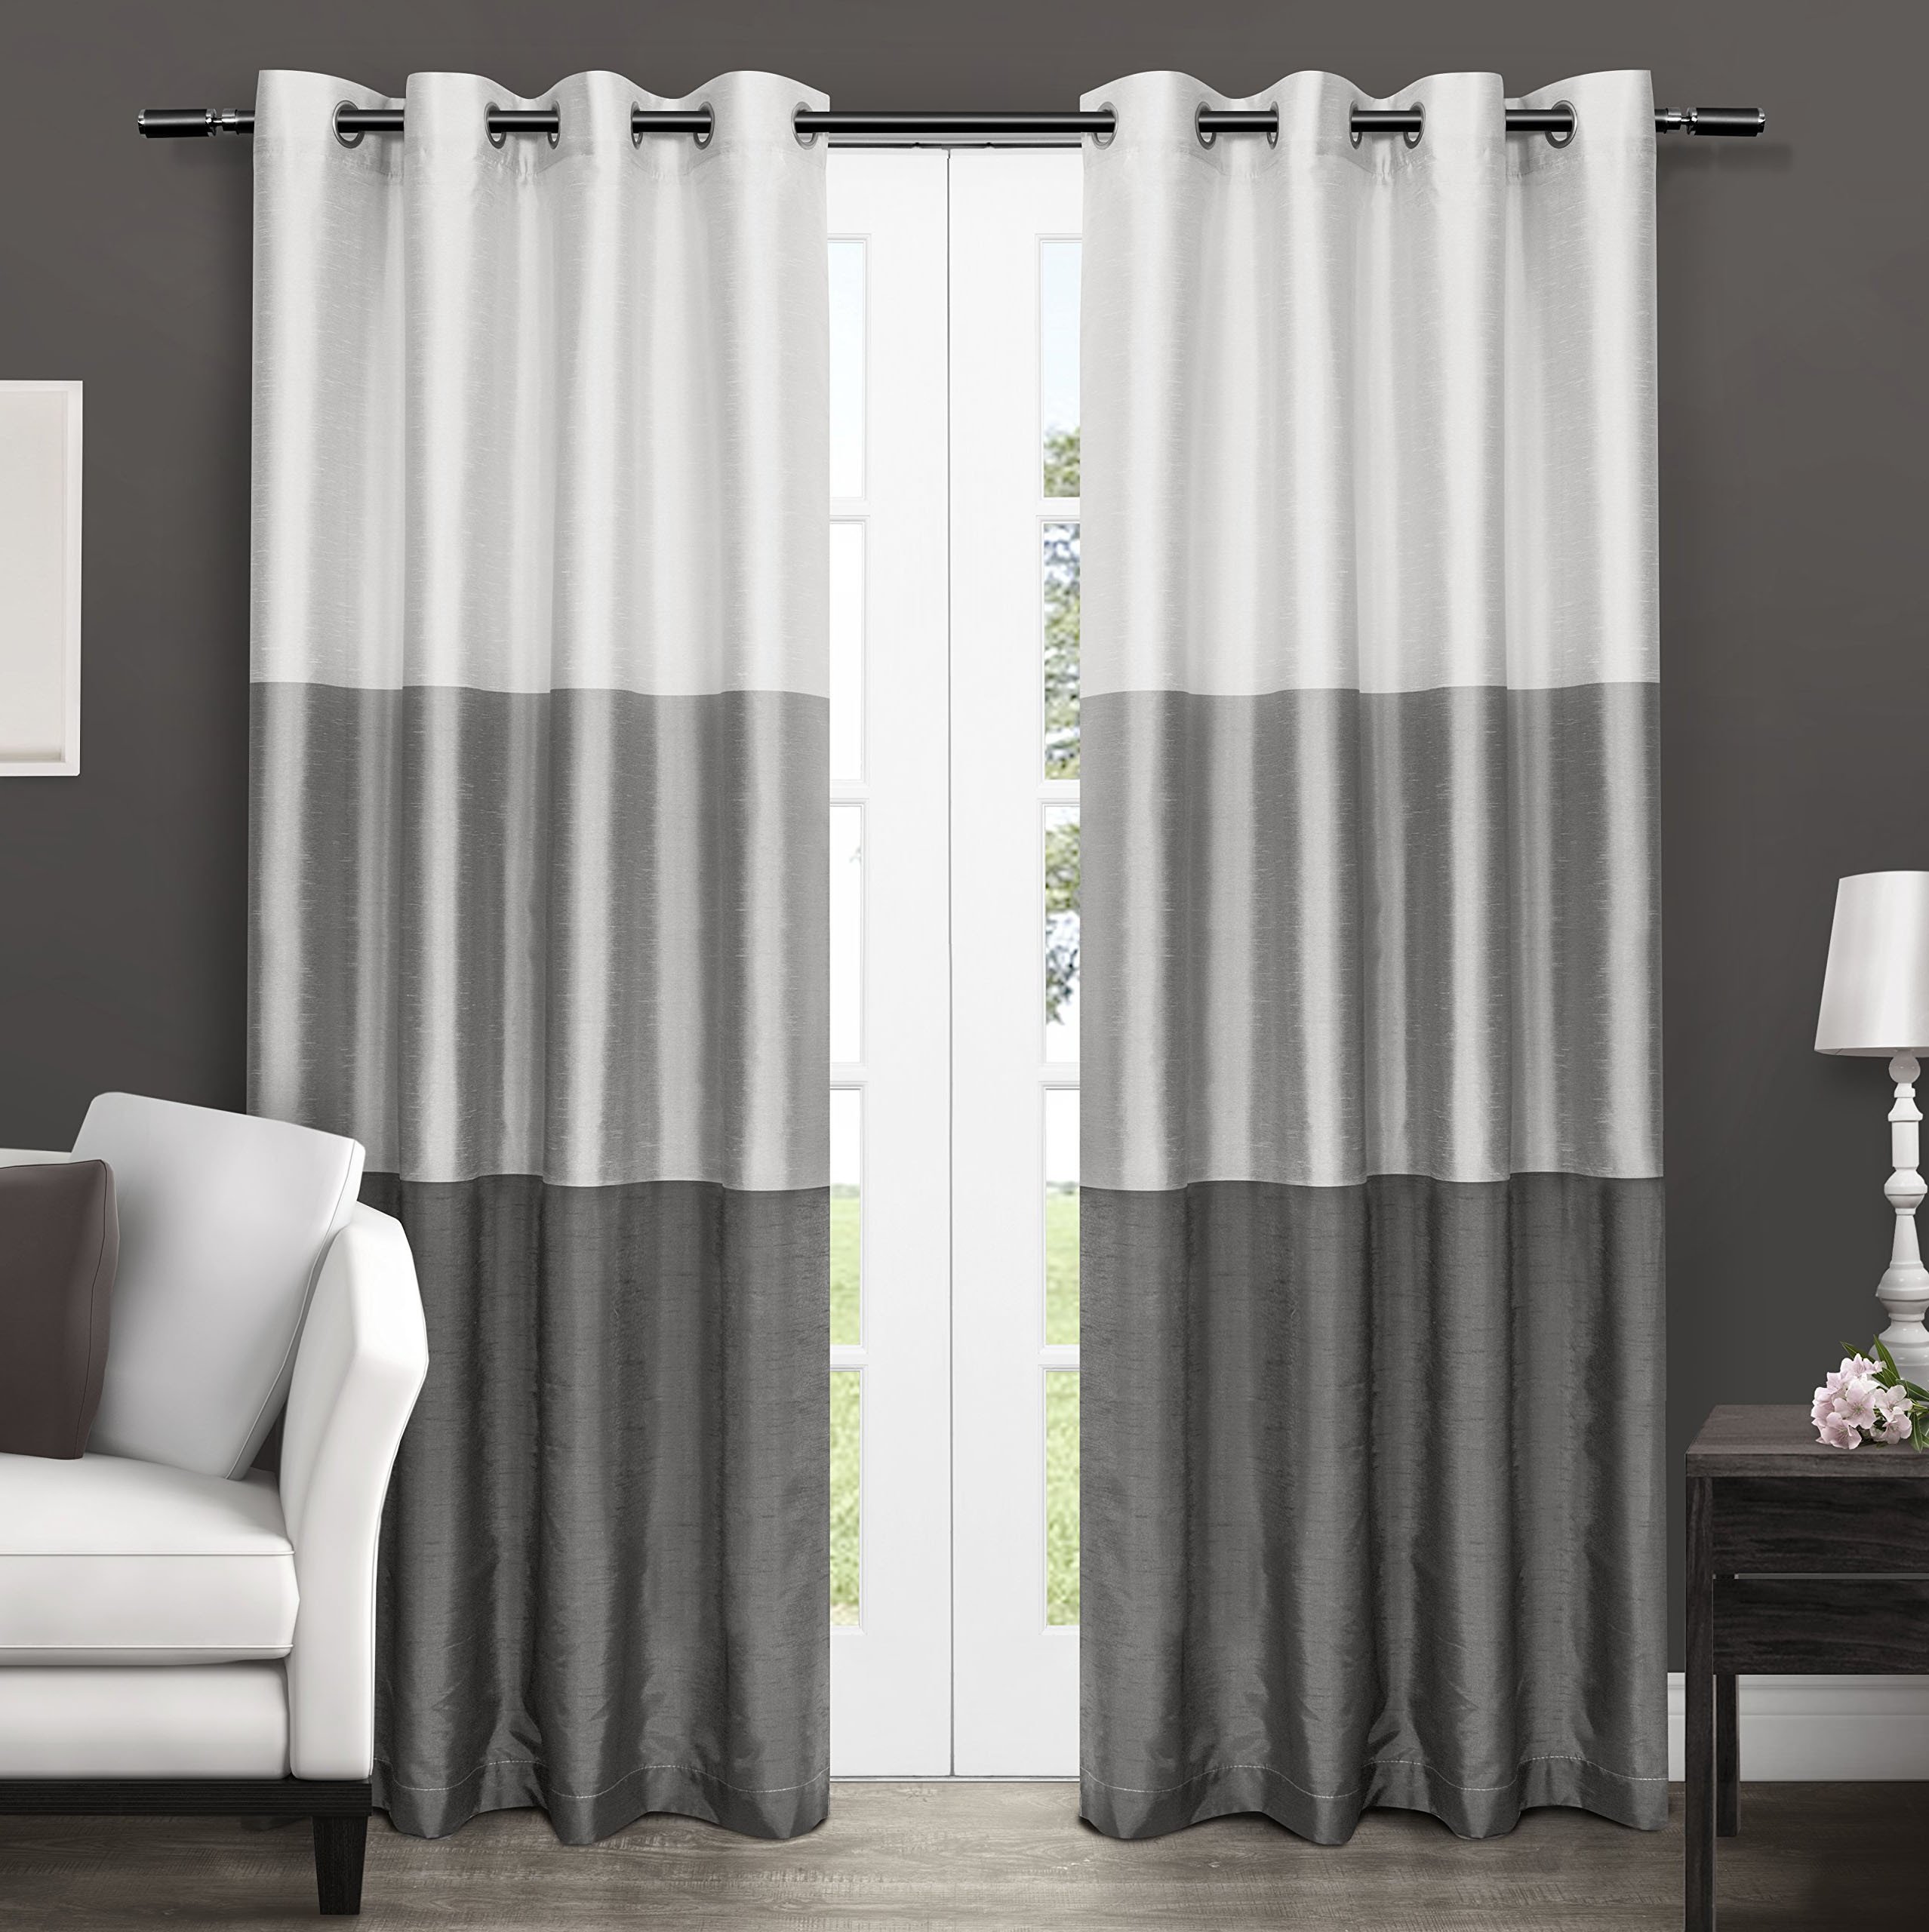 Gray Living Room Curtains  Light Dark Gray Color Block Modern Farmhouse Curtains For